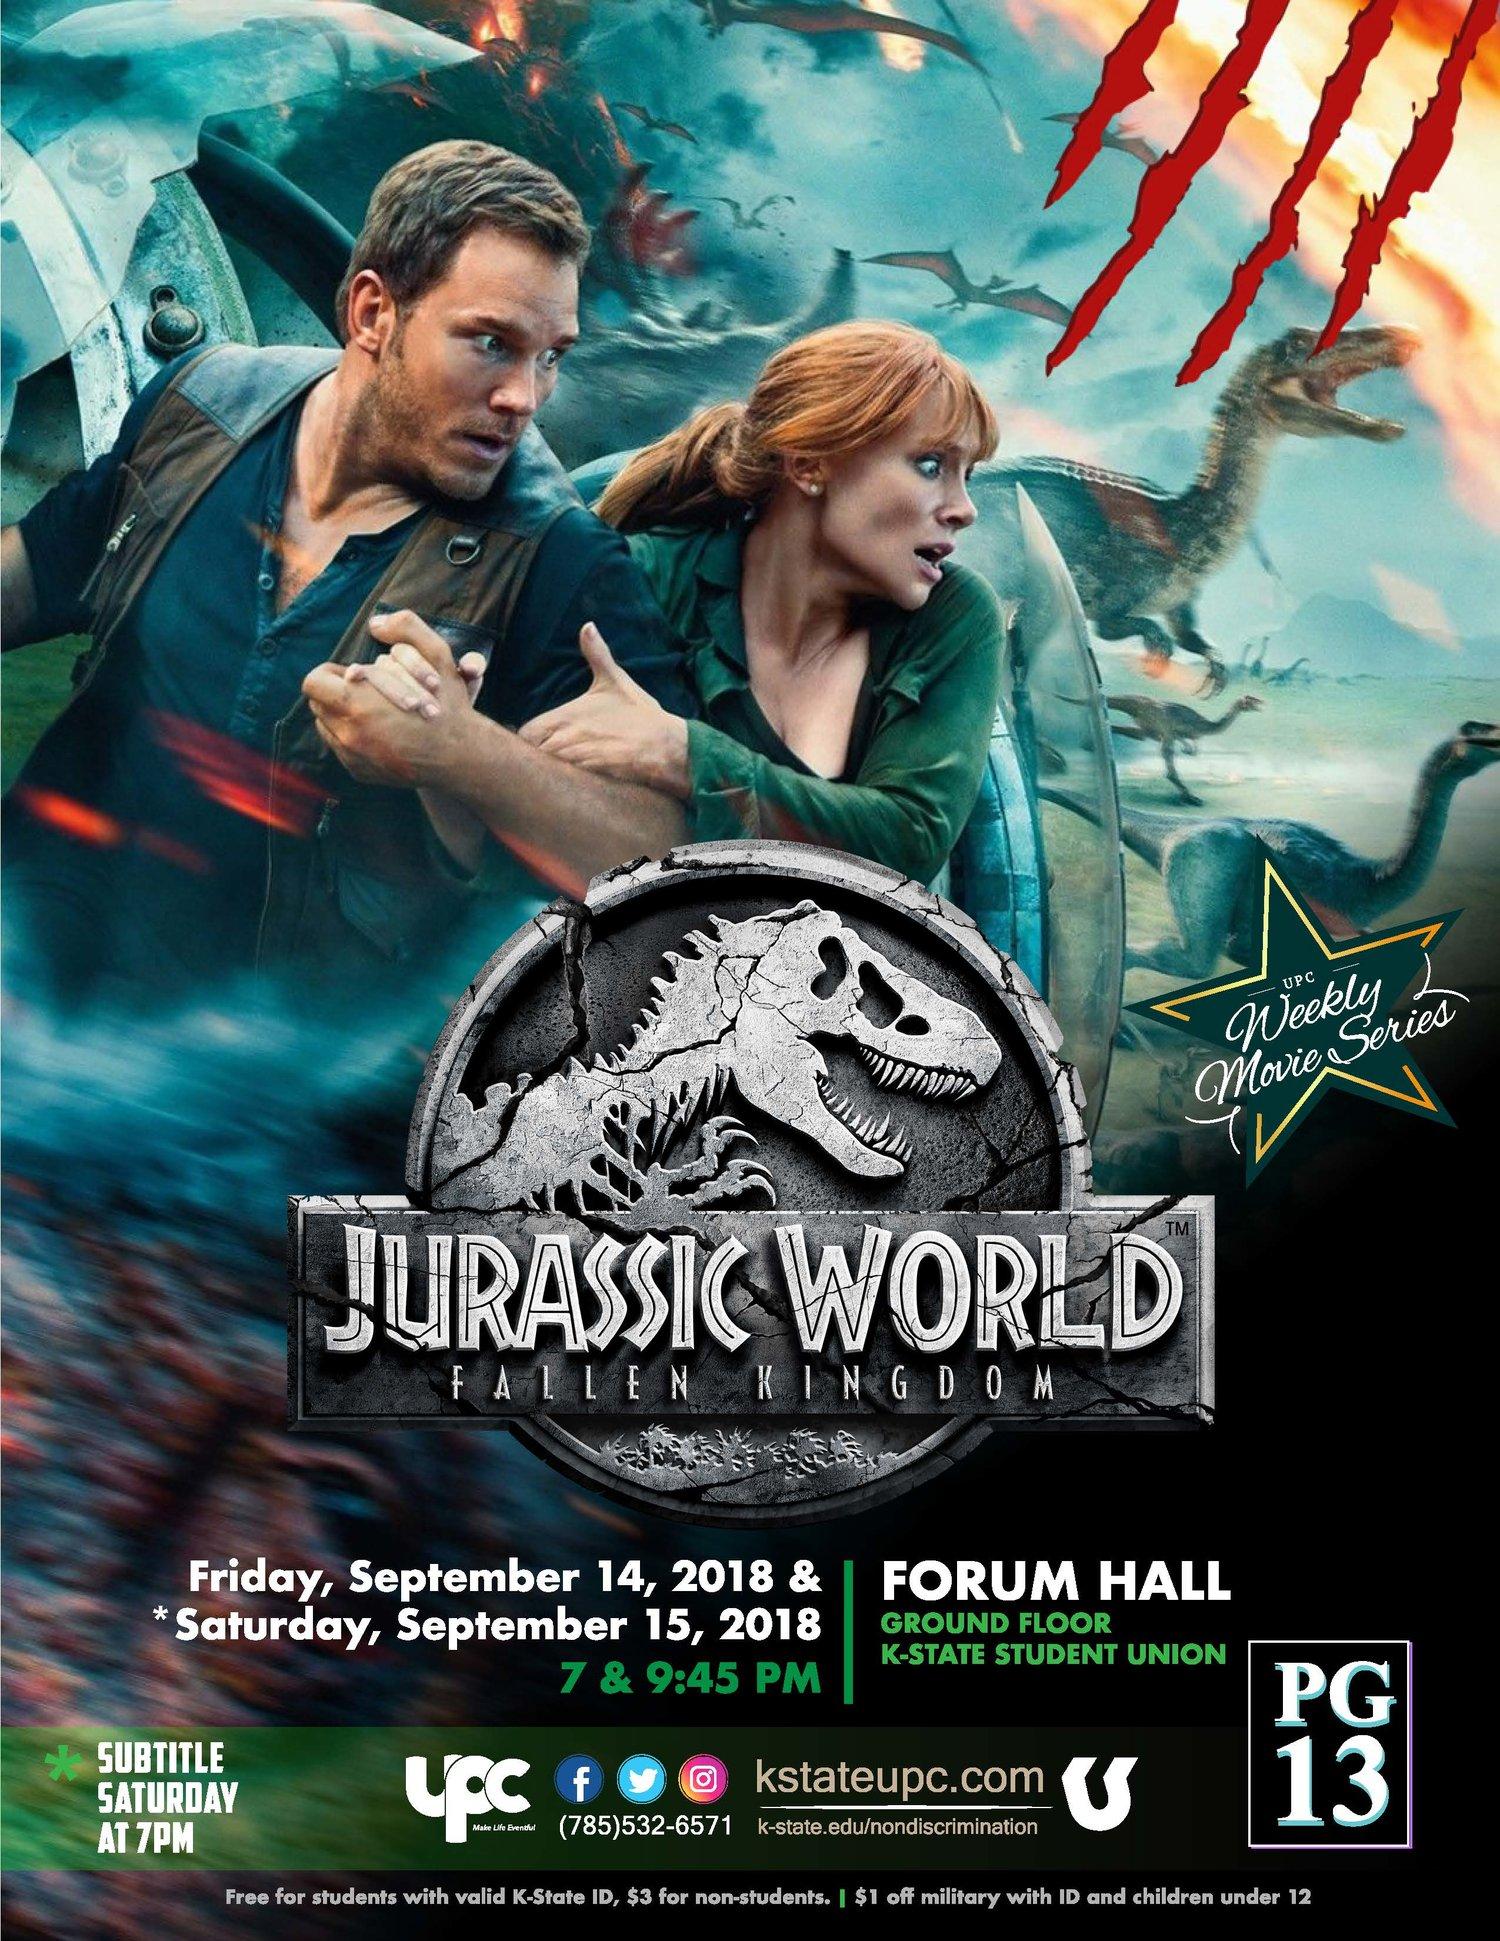 Film Jurassic World Fallen Kingdom Pg 13 K State Student Union Program Council